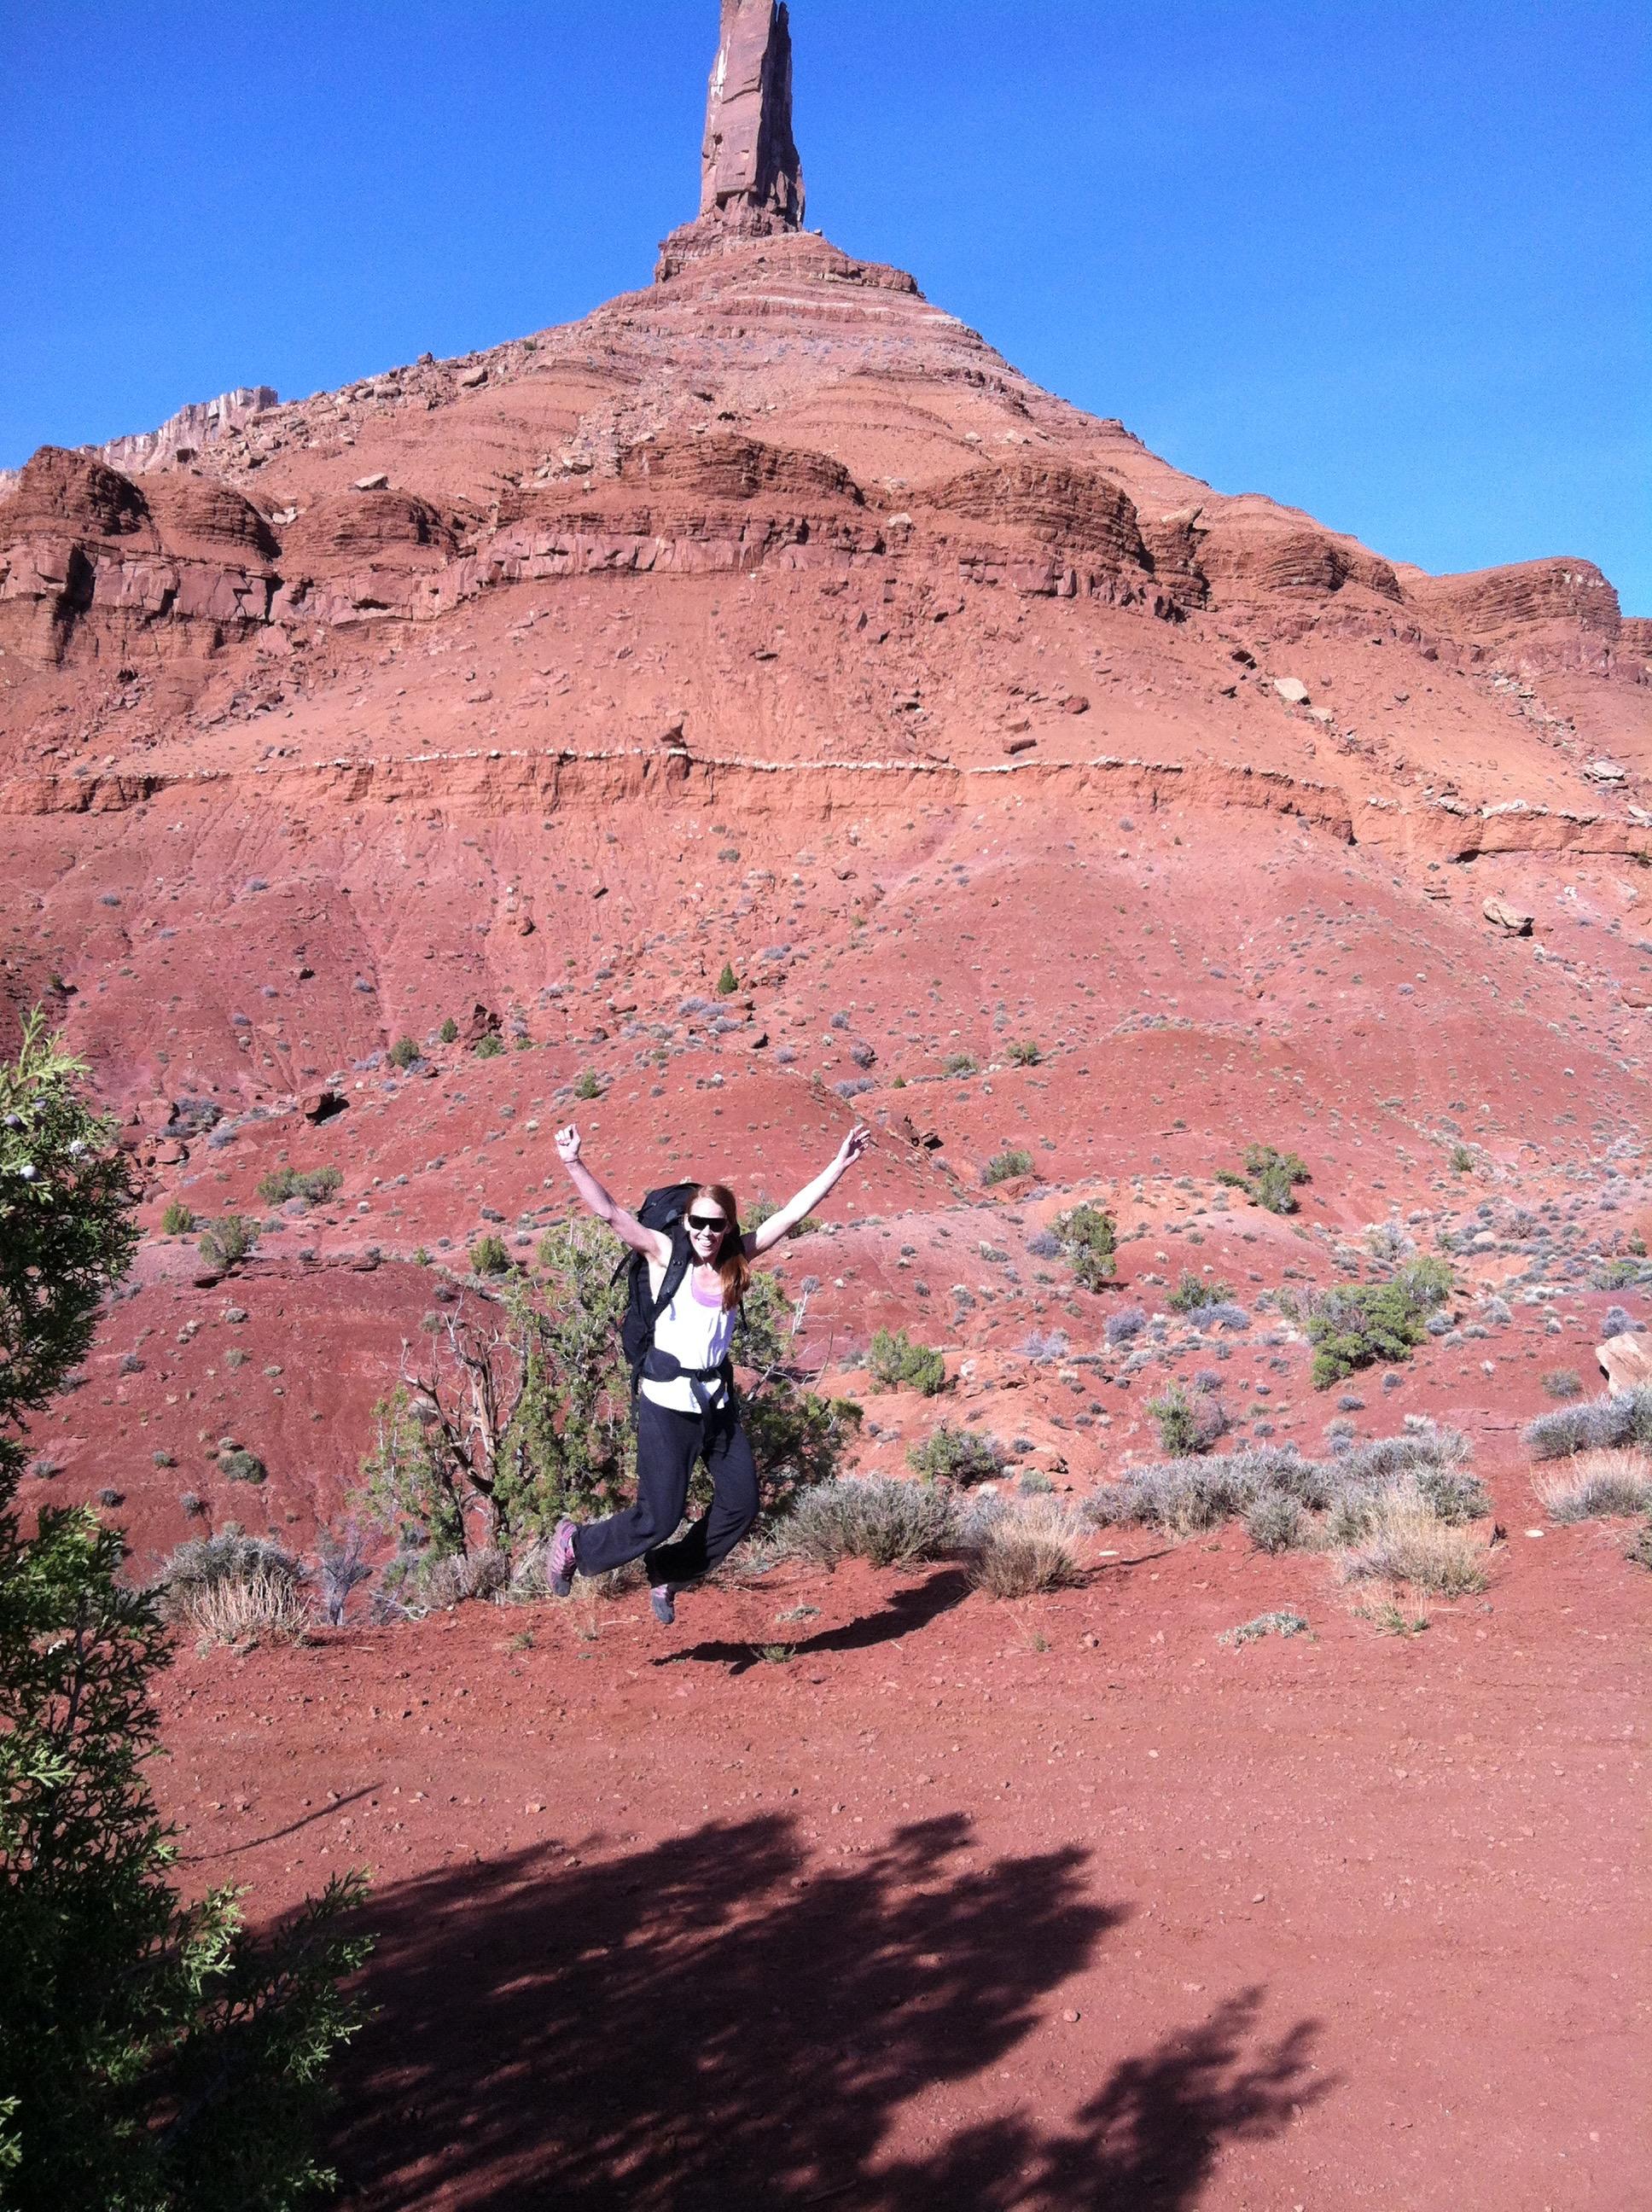 Rock Climbing Women - Road Trip Essentials - Leici Hendrix